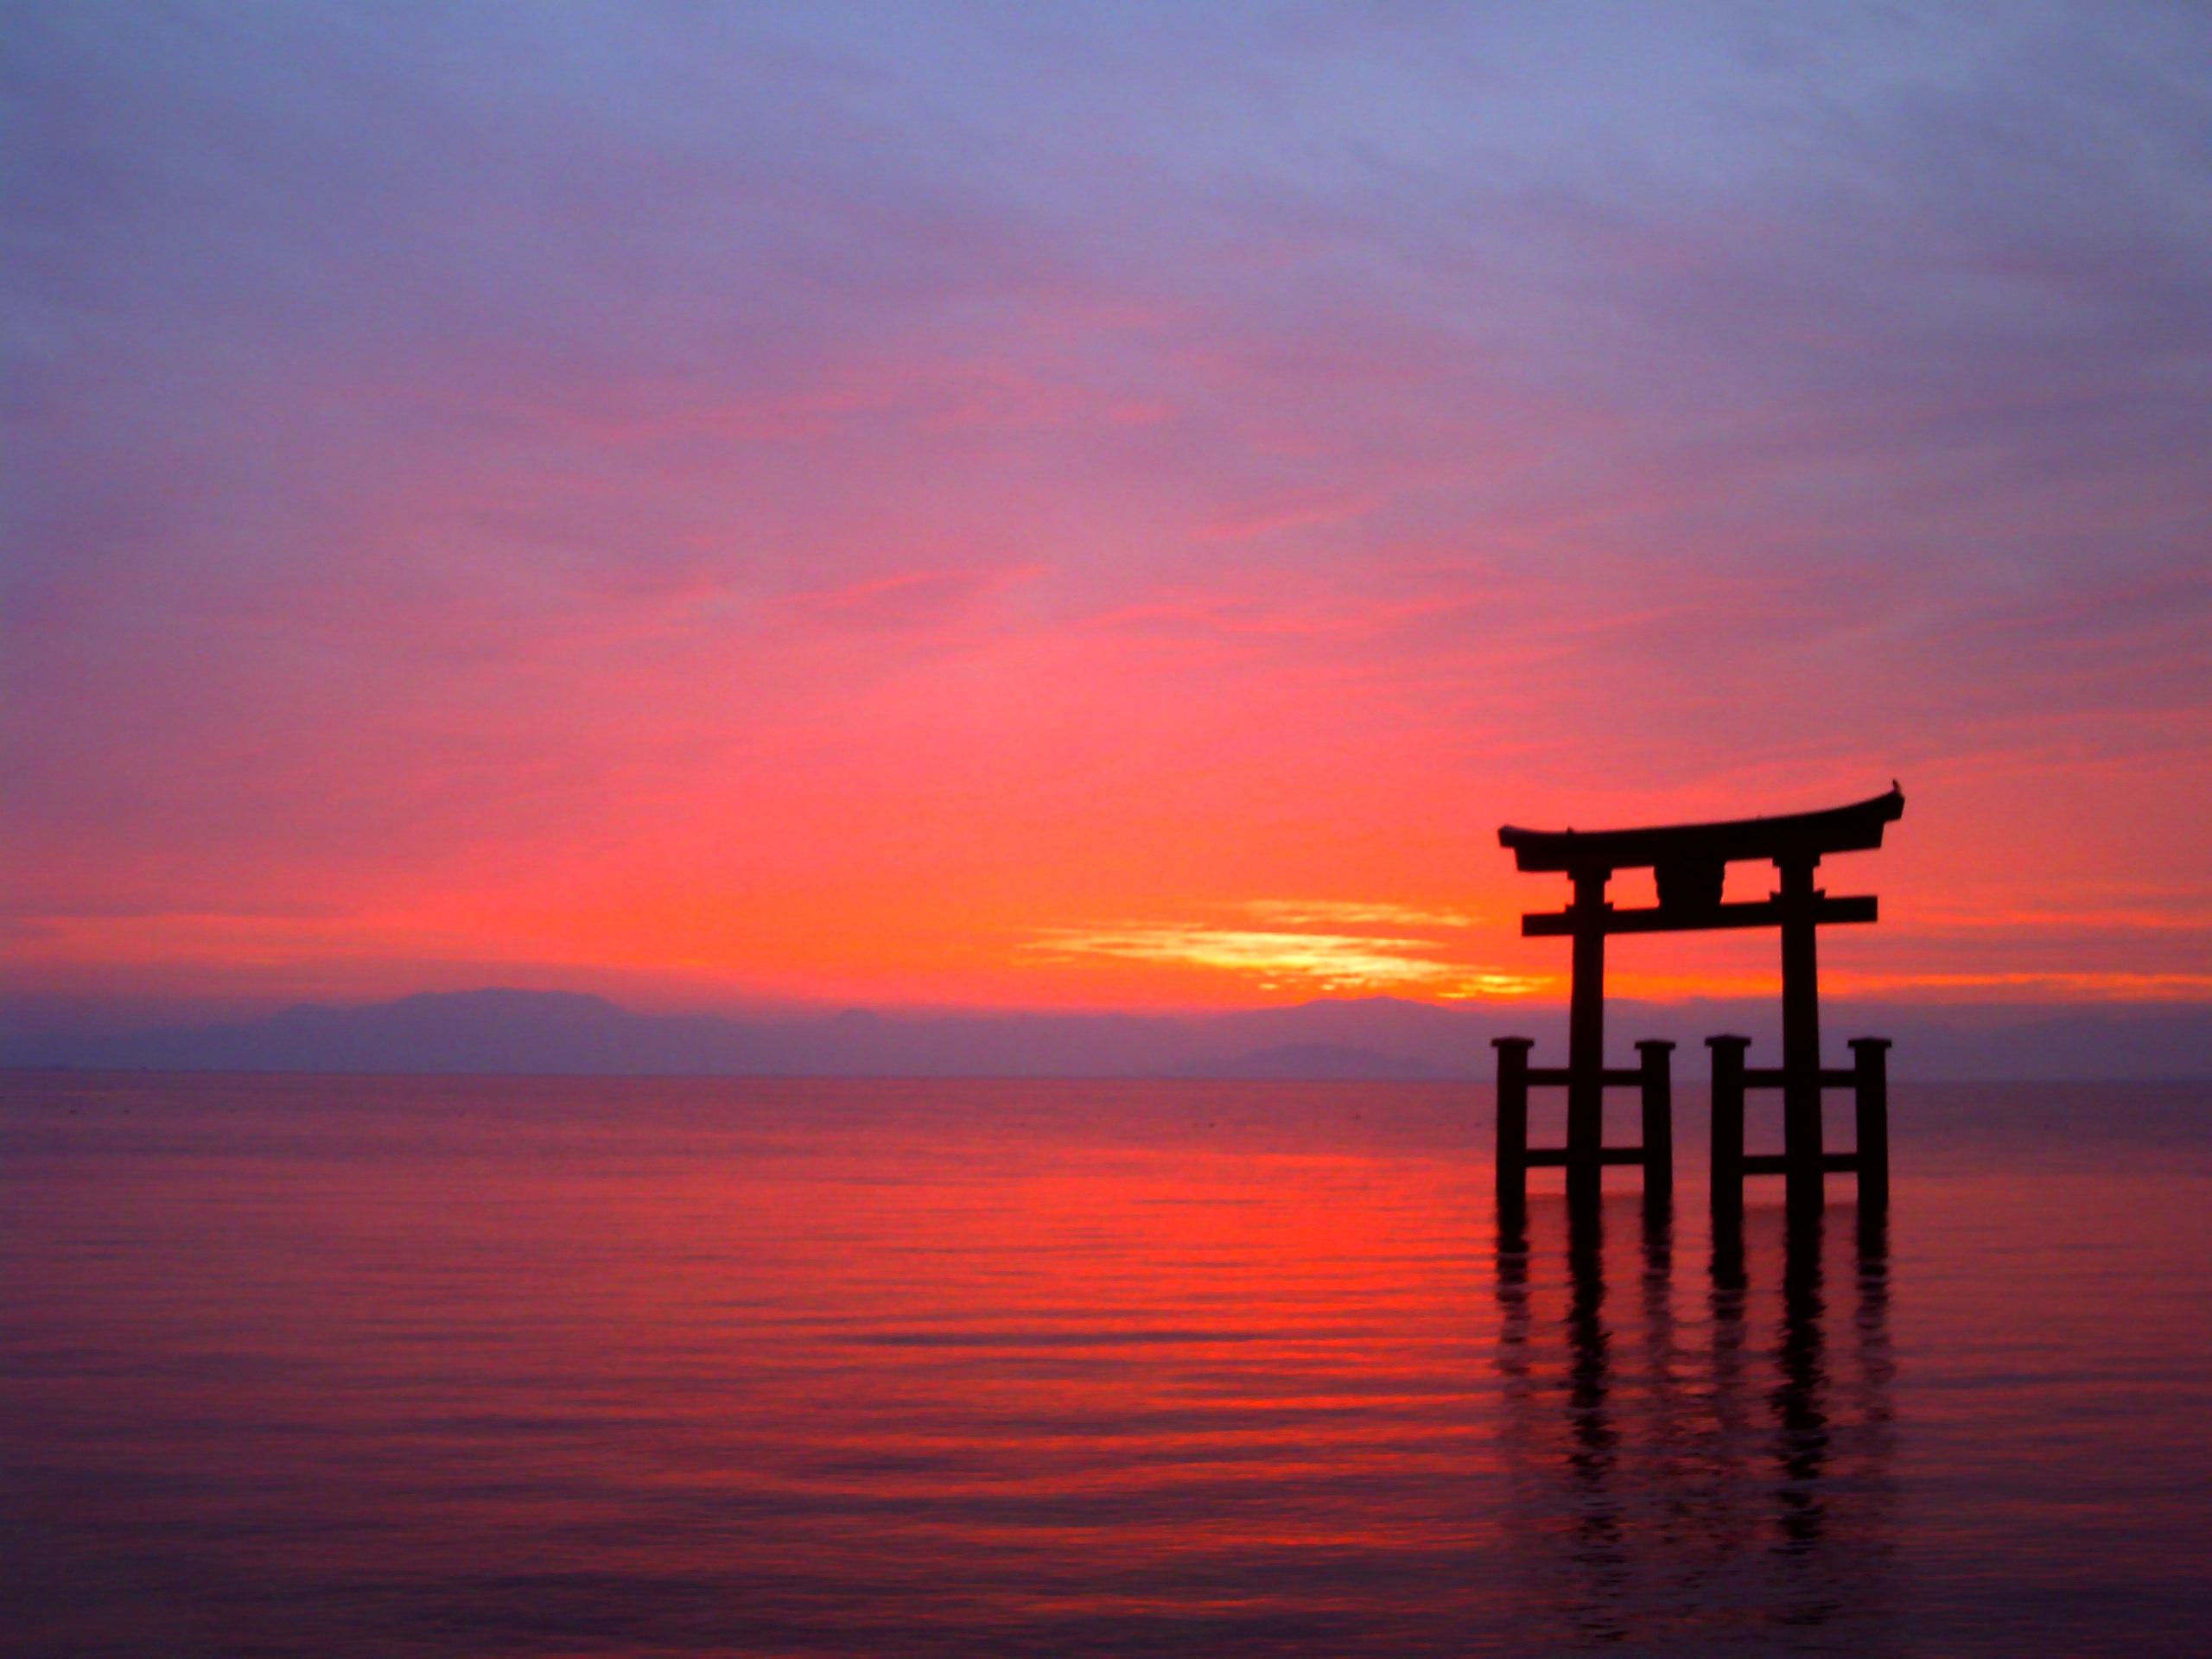 甘蜜1初冬の朝焼け(出先・旅先)vivicam5050